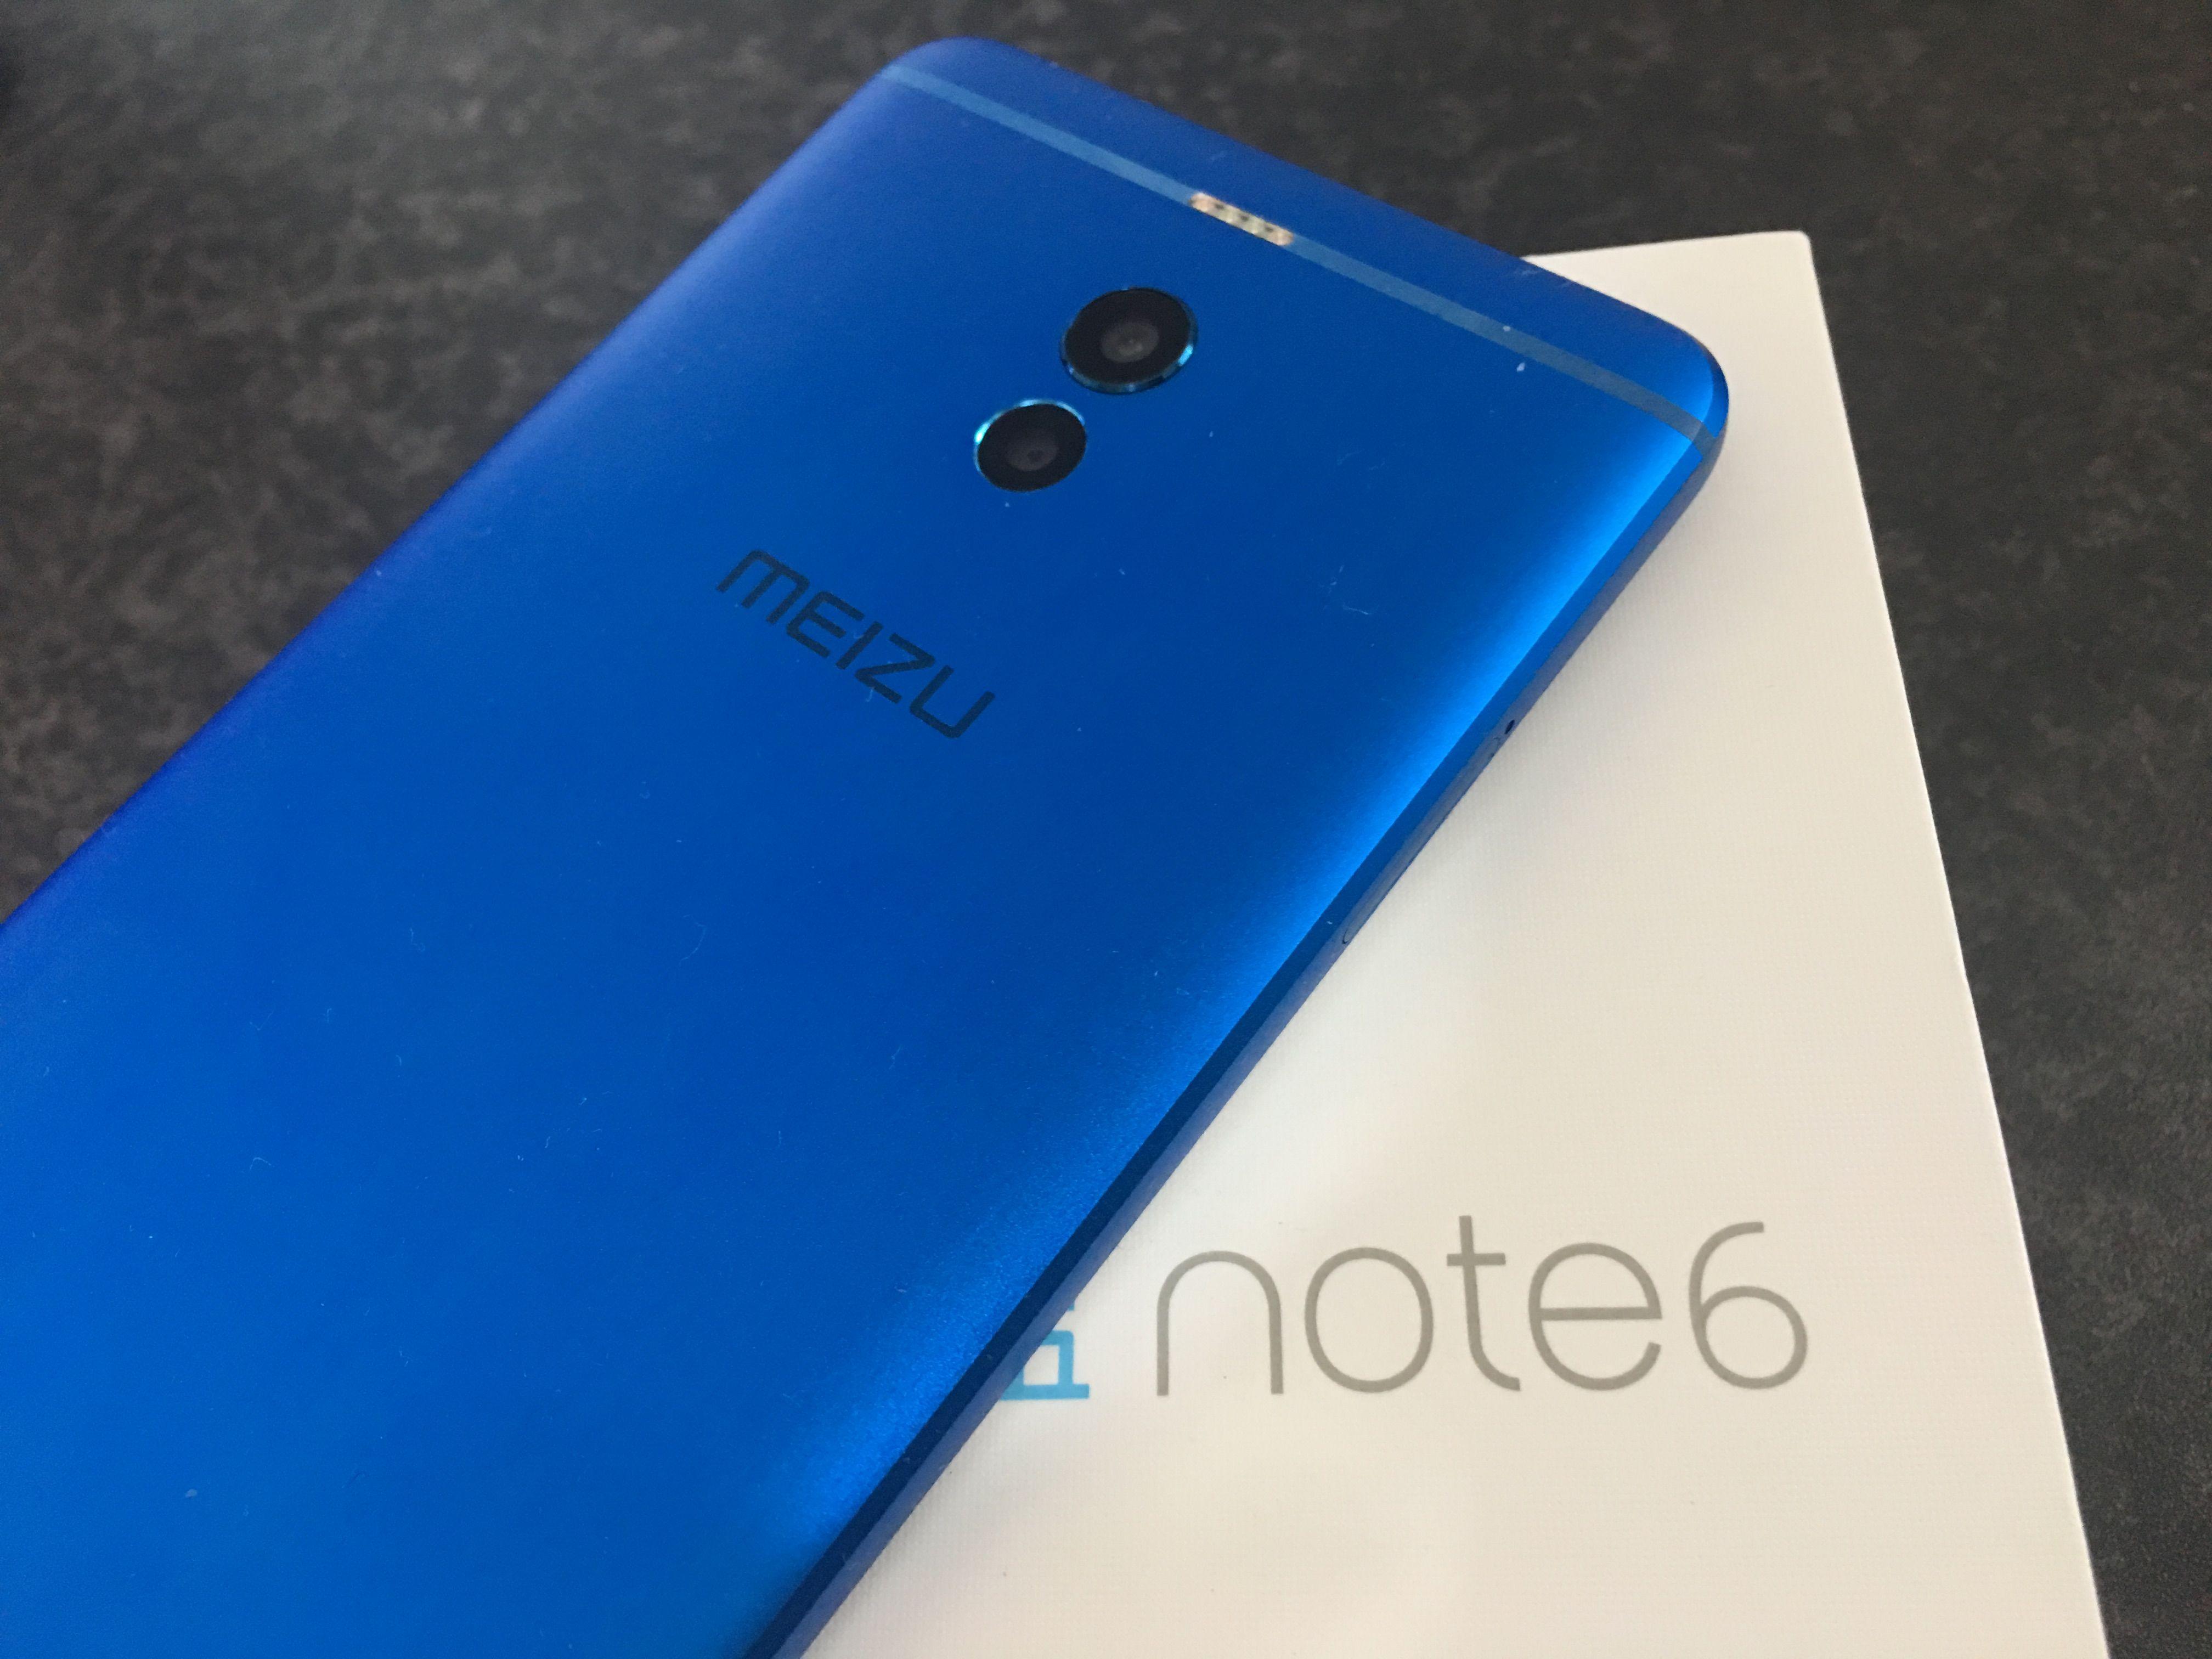 Meizu M6 Noteのフォトレビュー – Snapdragon 625+デュアルカメラで完璧なスマートフォン